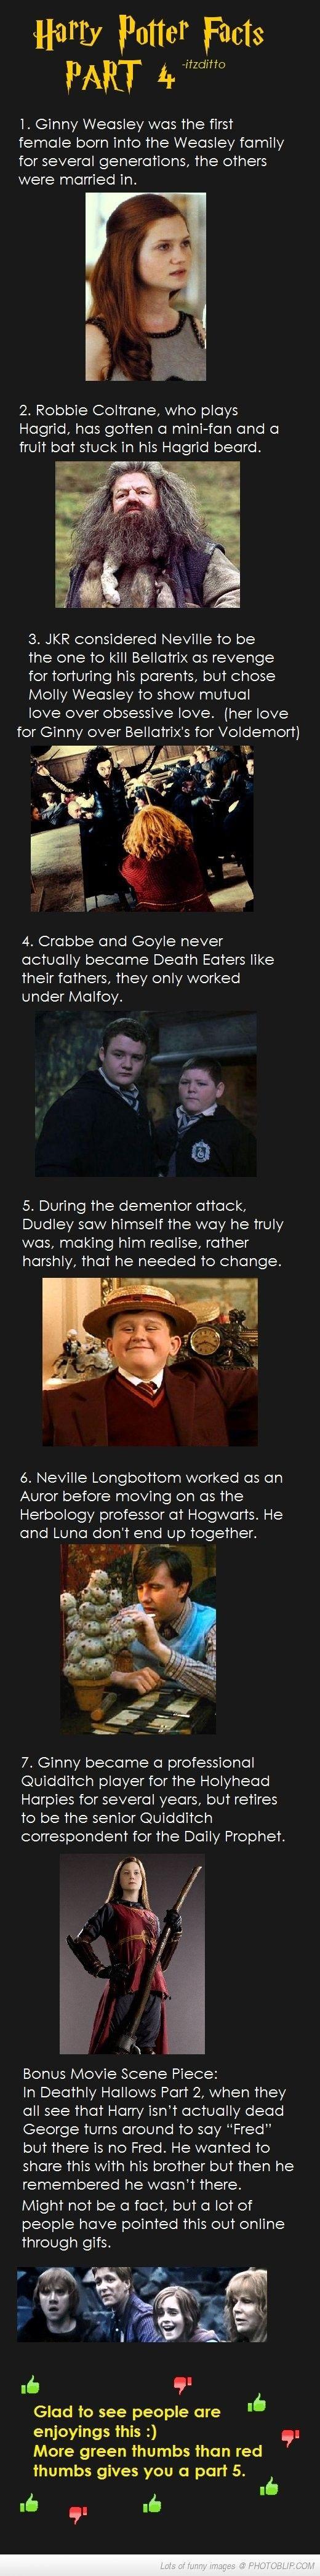 Harry Potter Facts Part